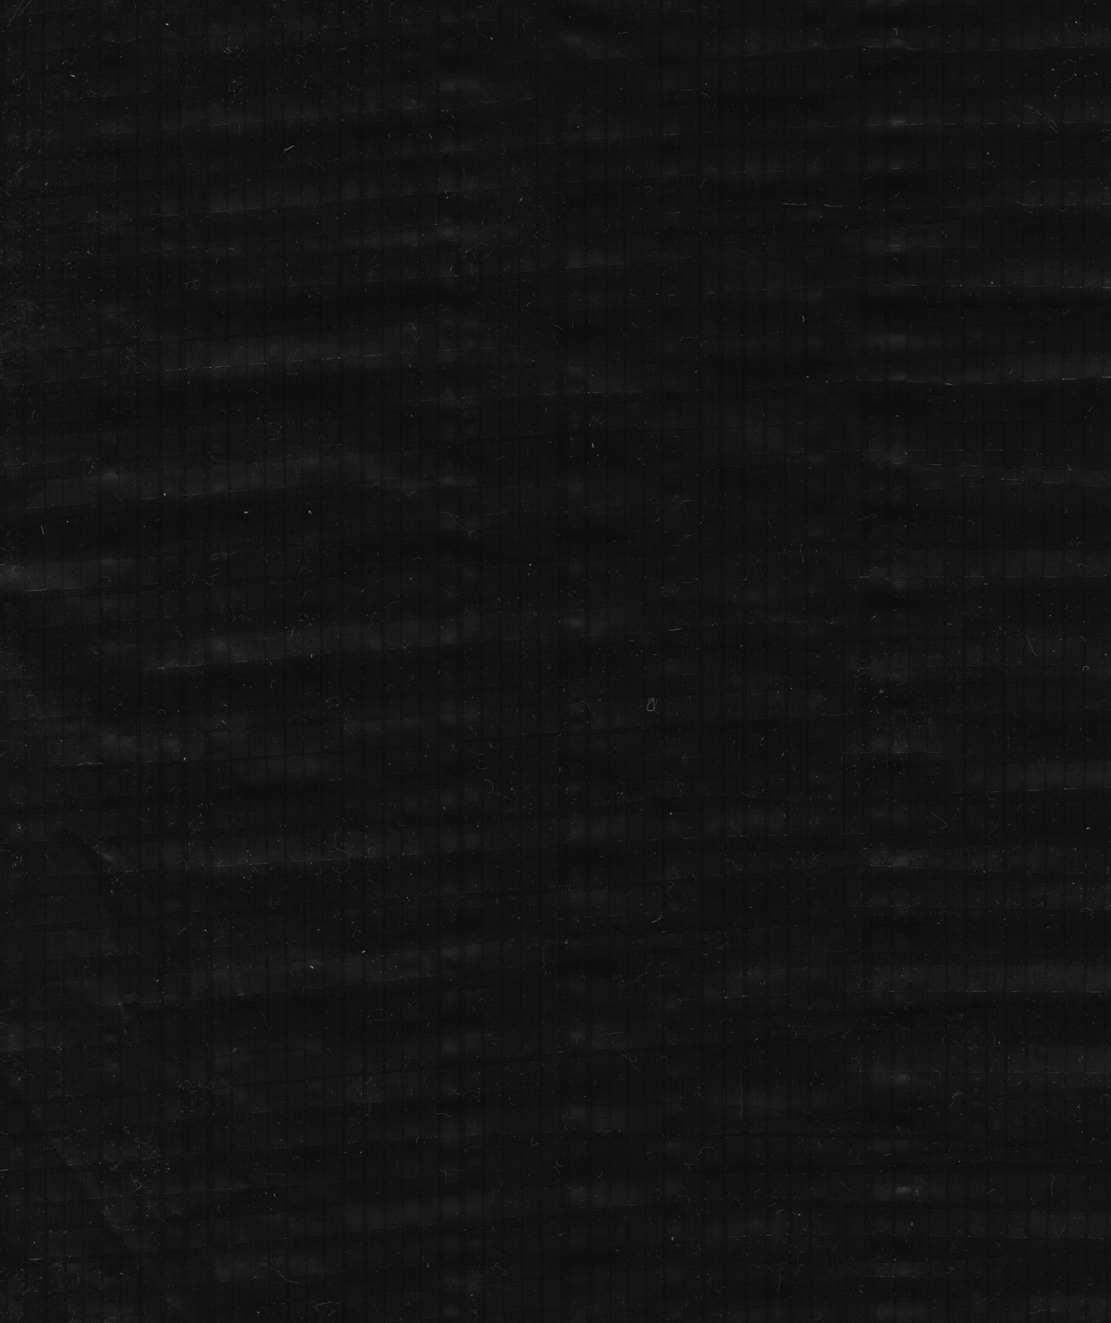 TS-5000 Black/White Polywrap (5 MIL ECONOMICAL 2-SIDED REINFORCED POLYETHYLENE)